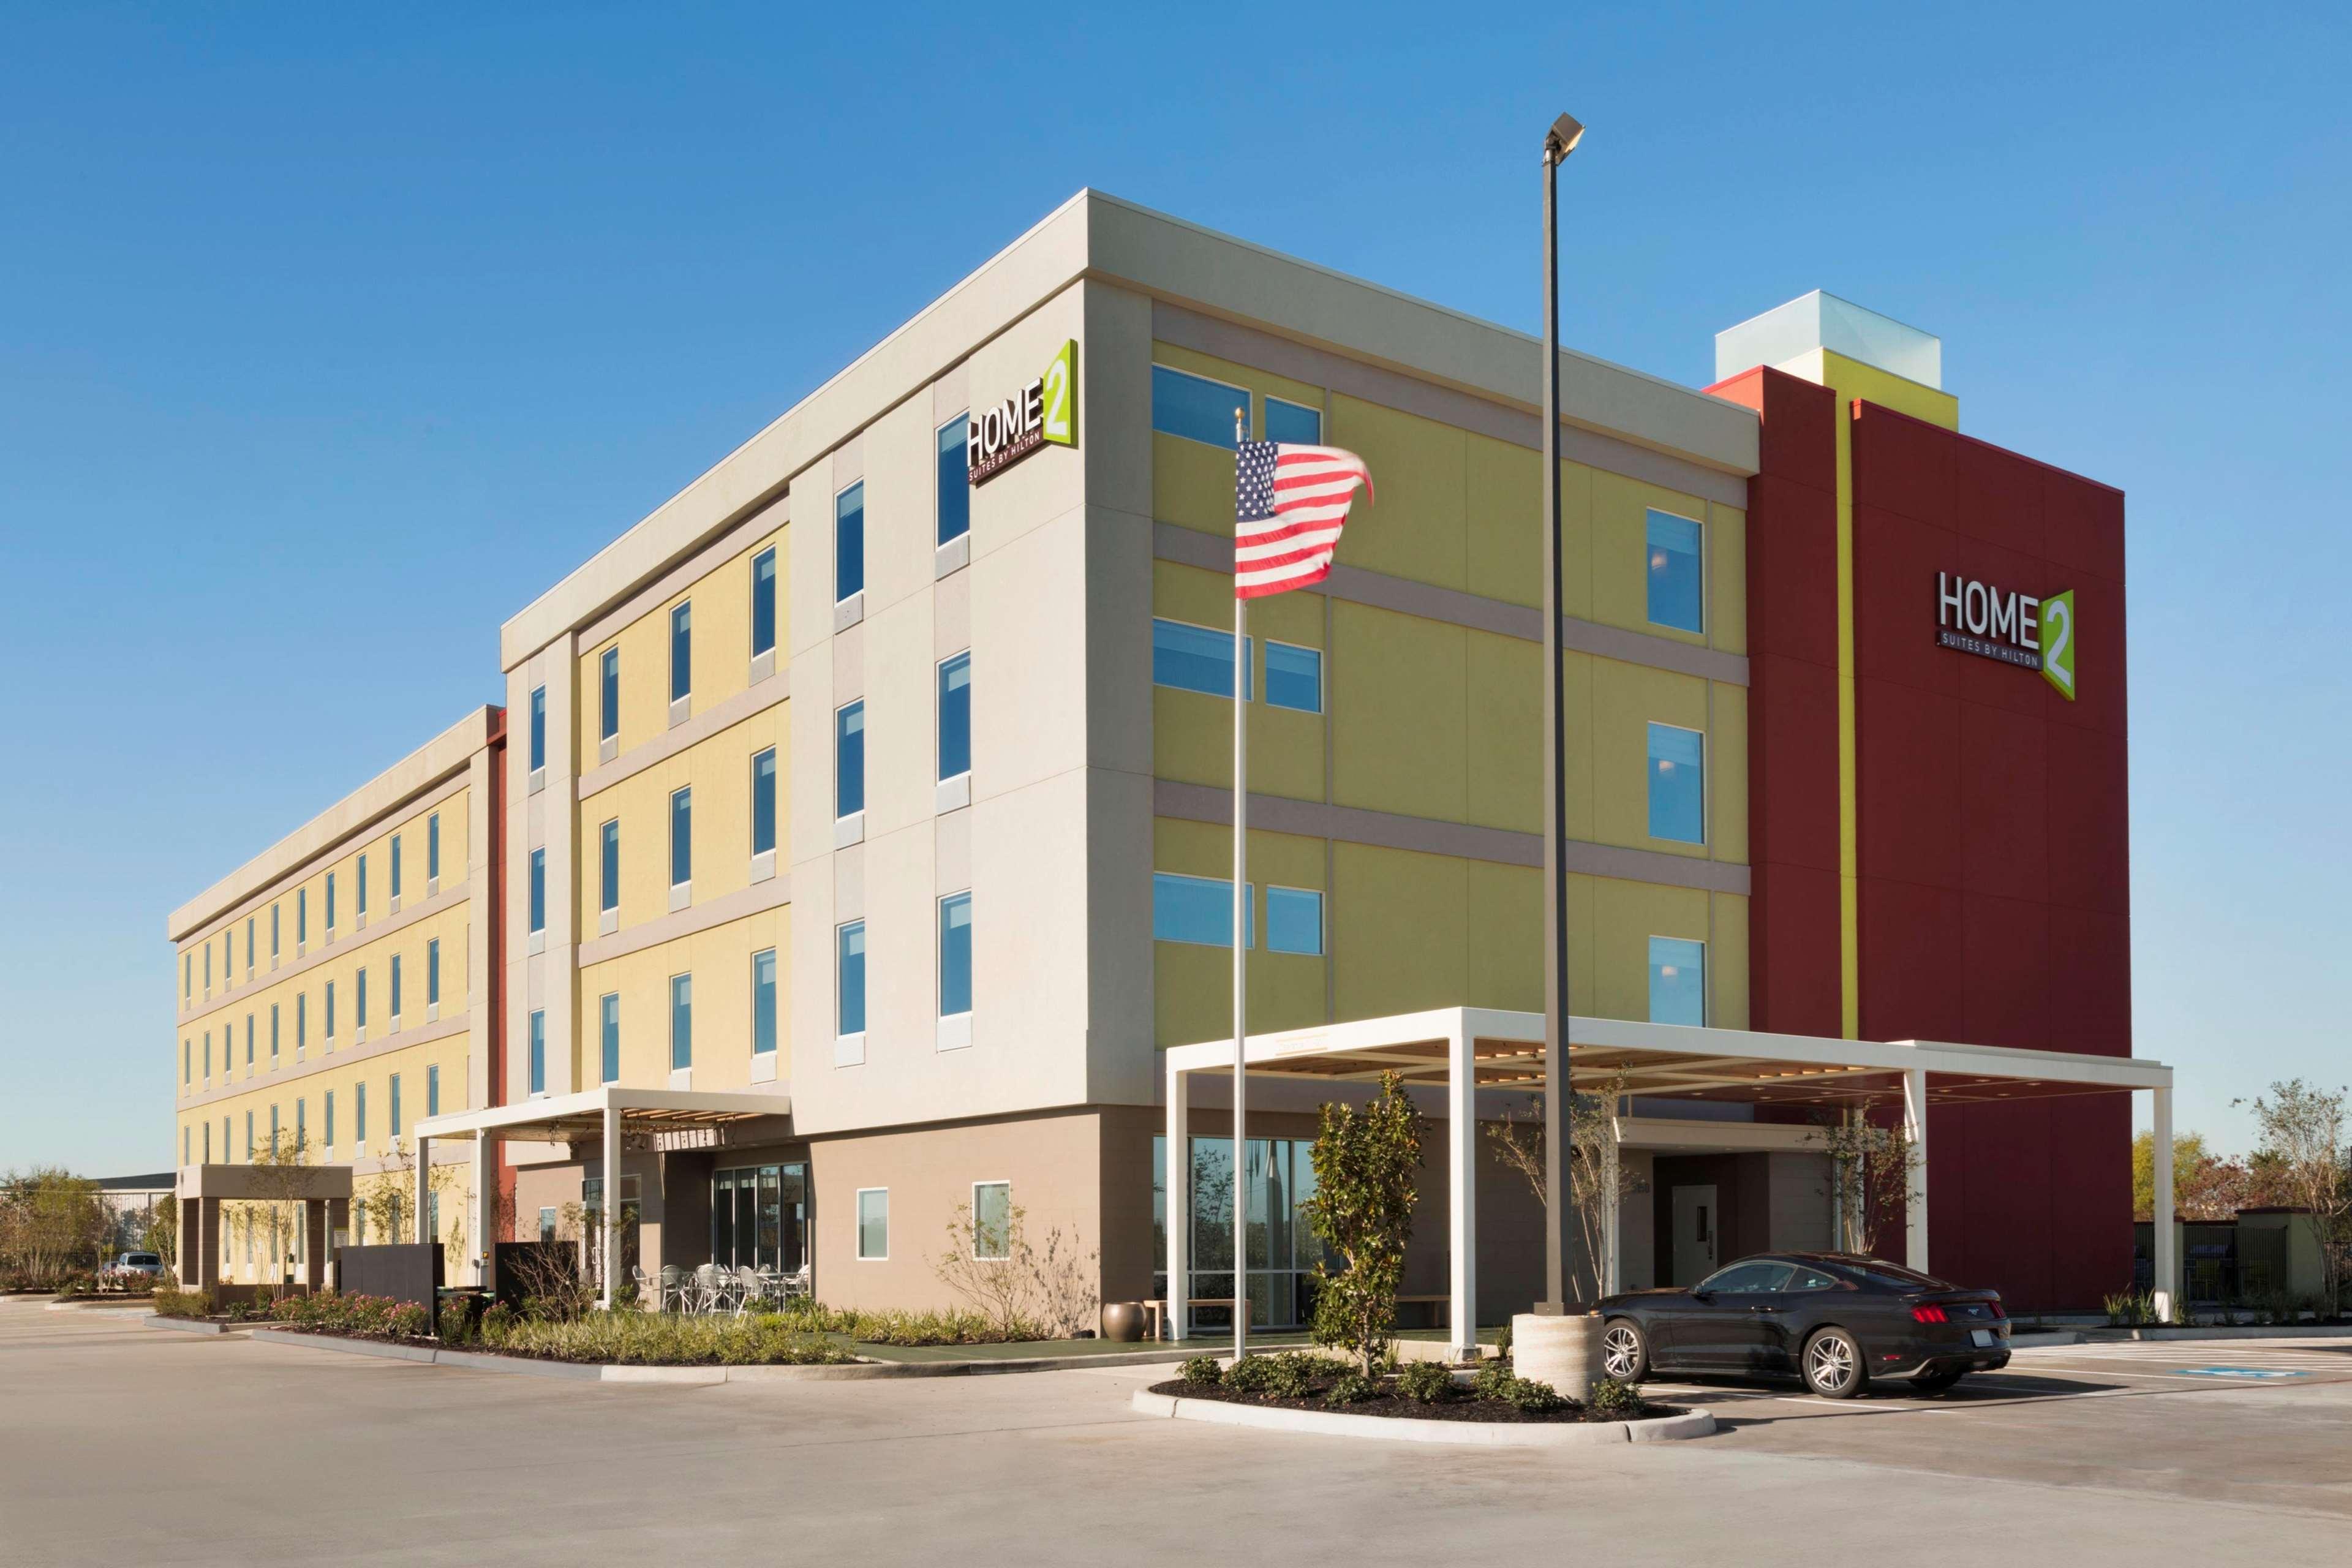 Home2 Suites by Hilton Houston Pasadena image 20